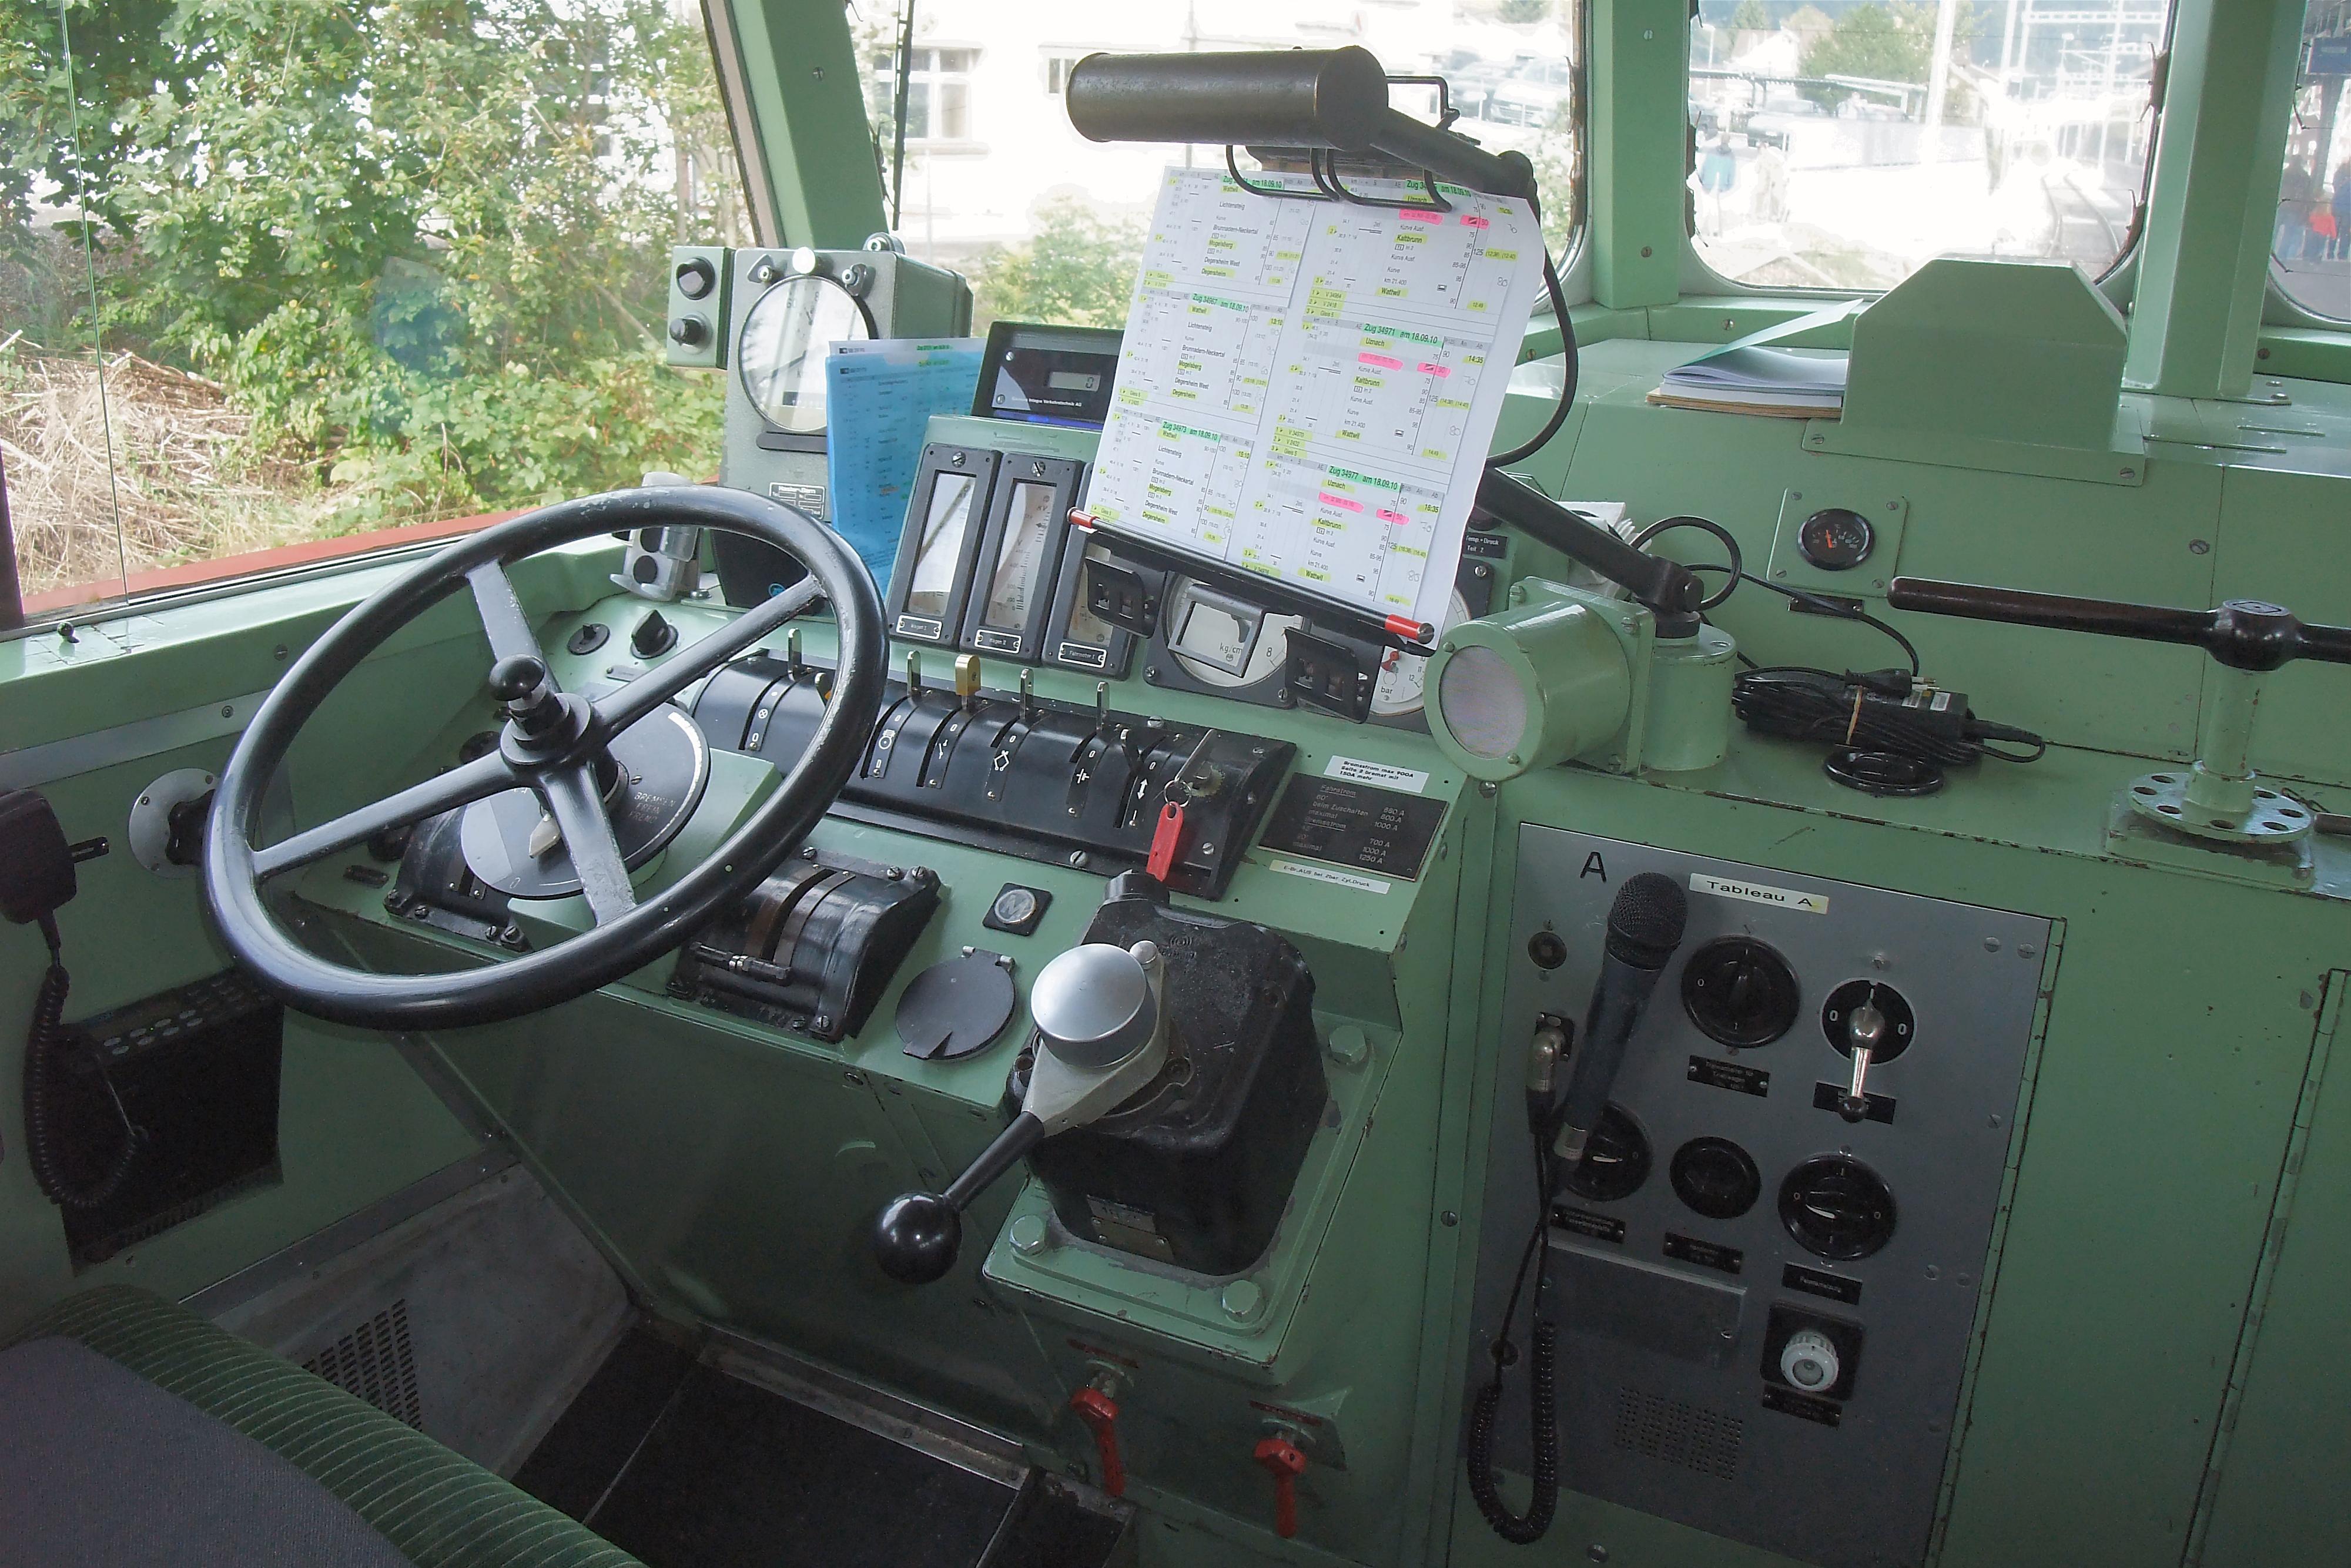 File:SBB RAe 4-8 1021 Driver's Cab (5003296311).jpg